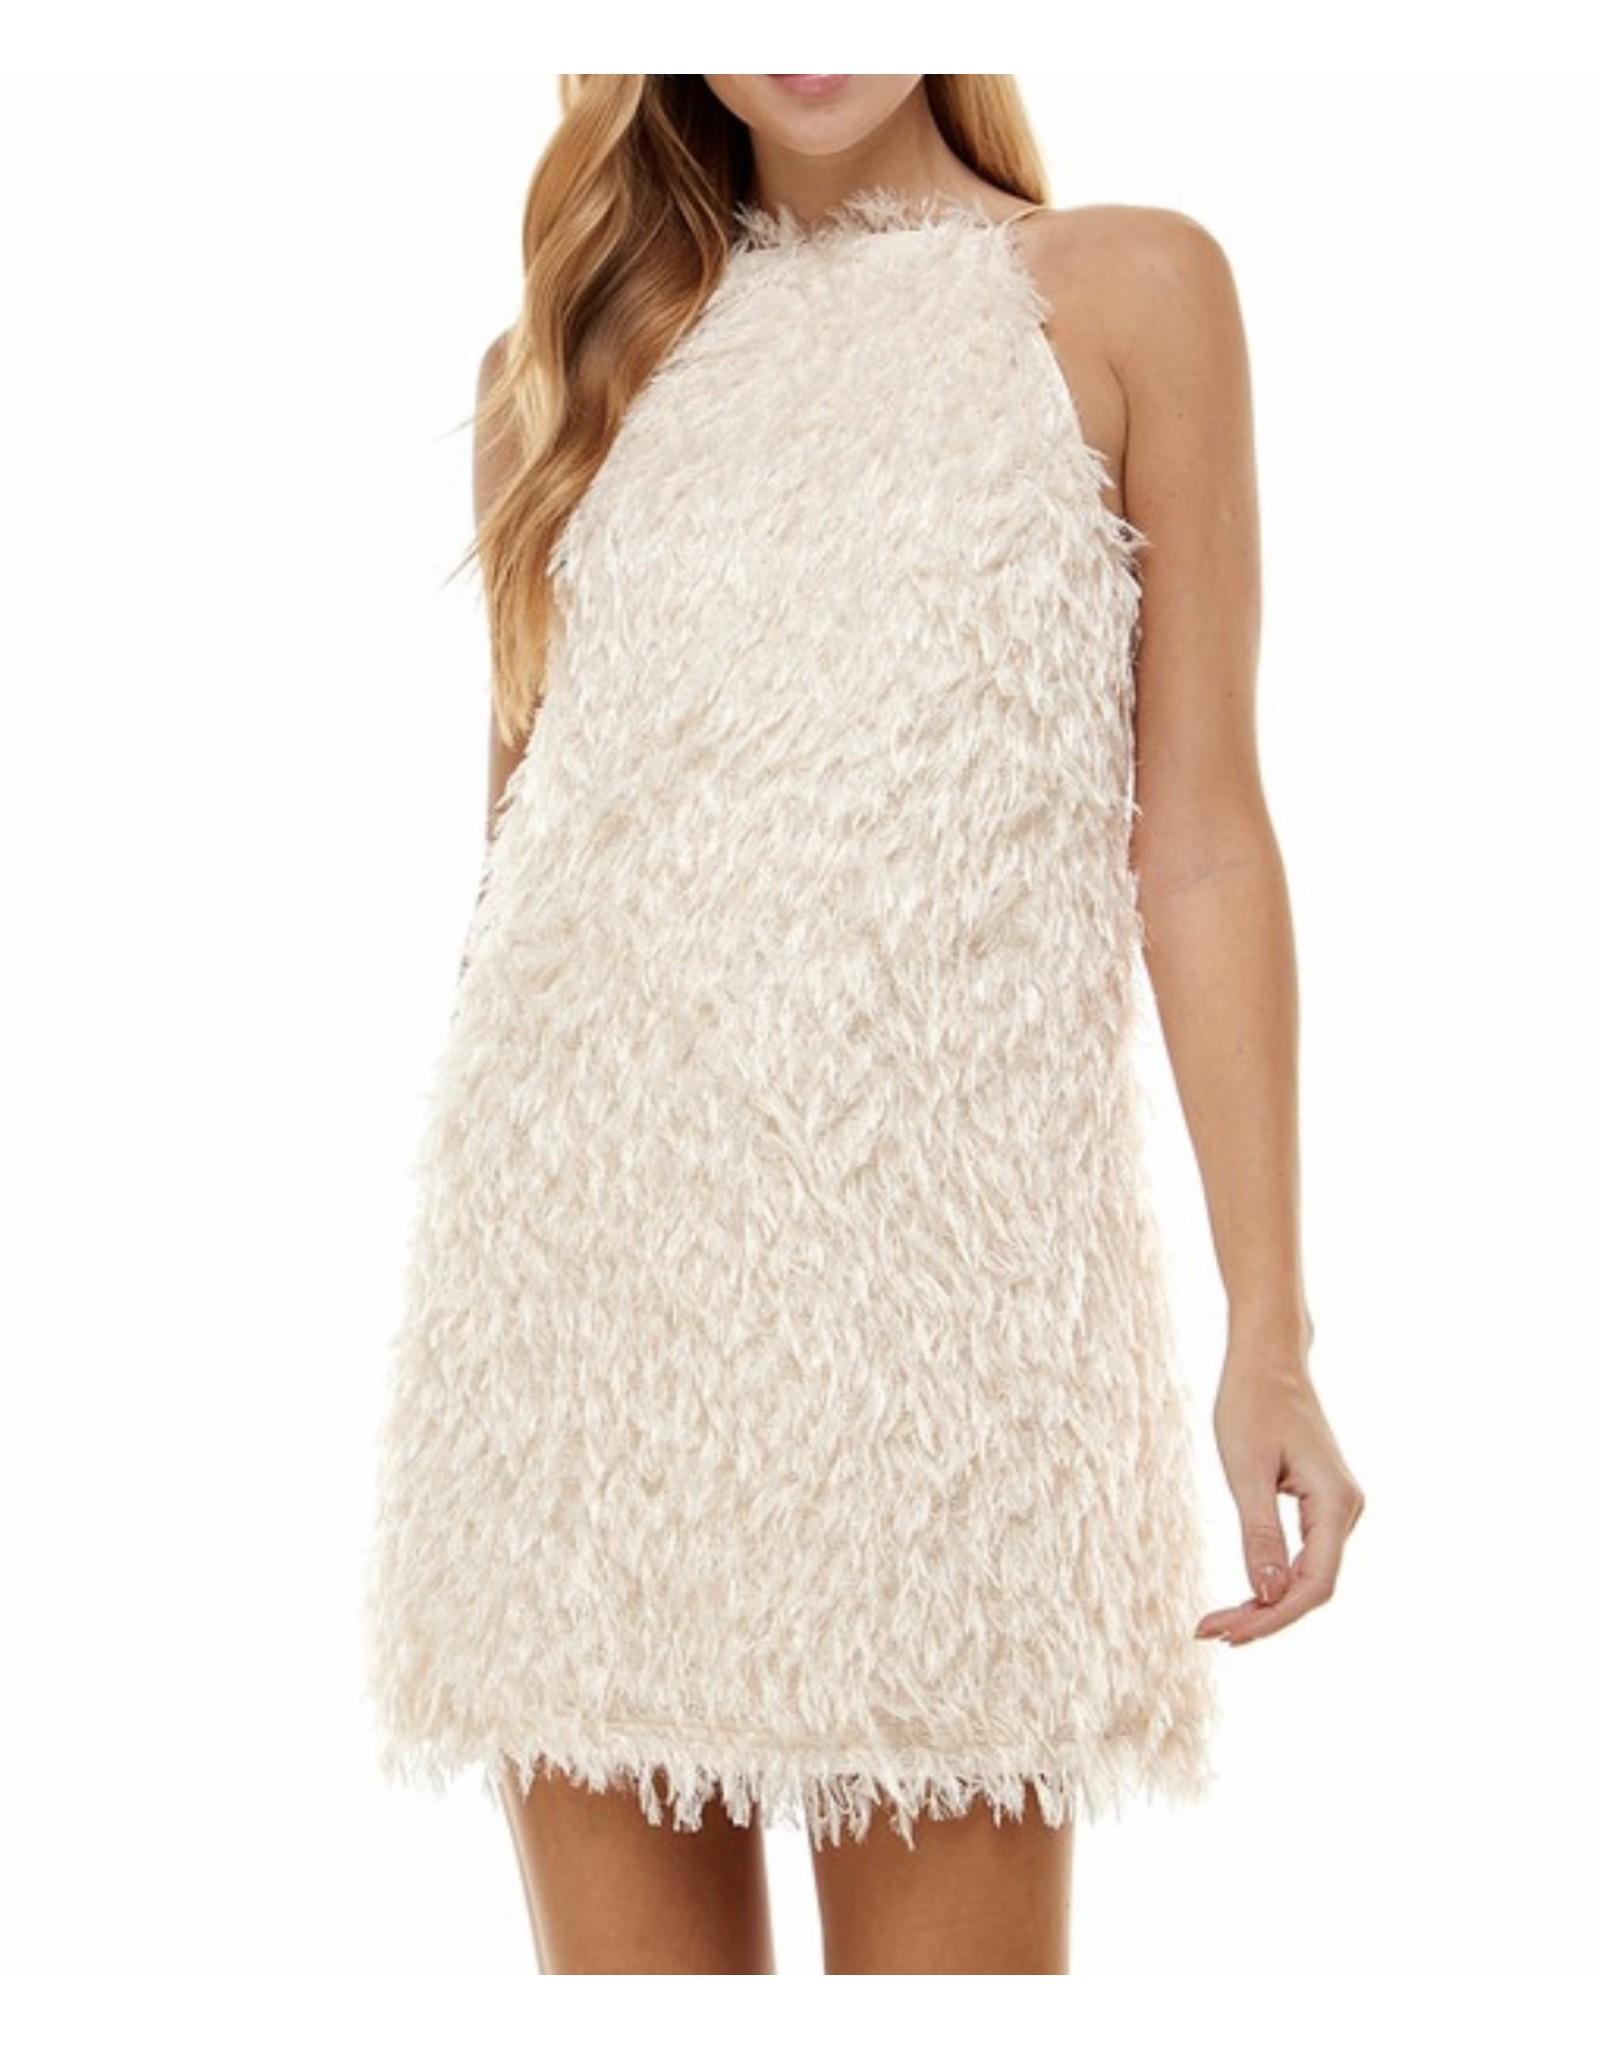 Shaggy Party Dress